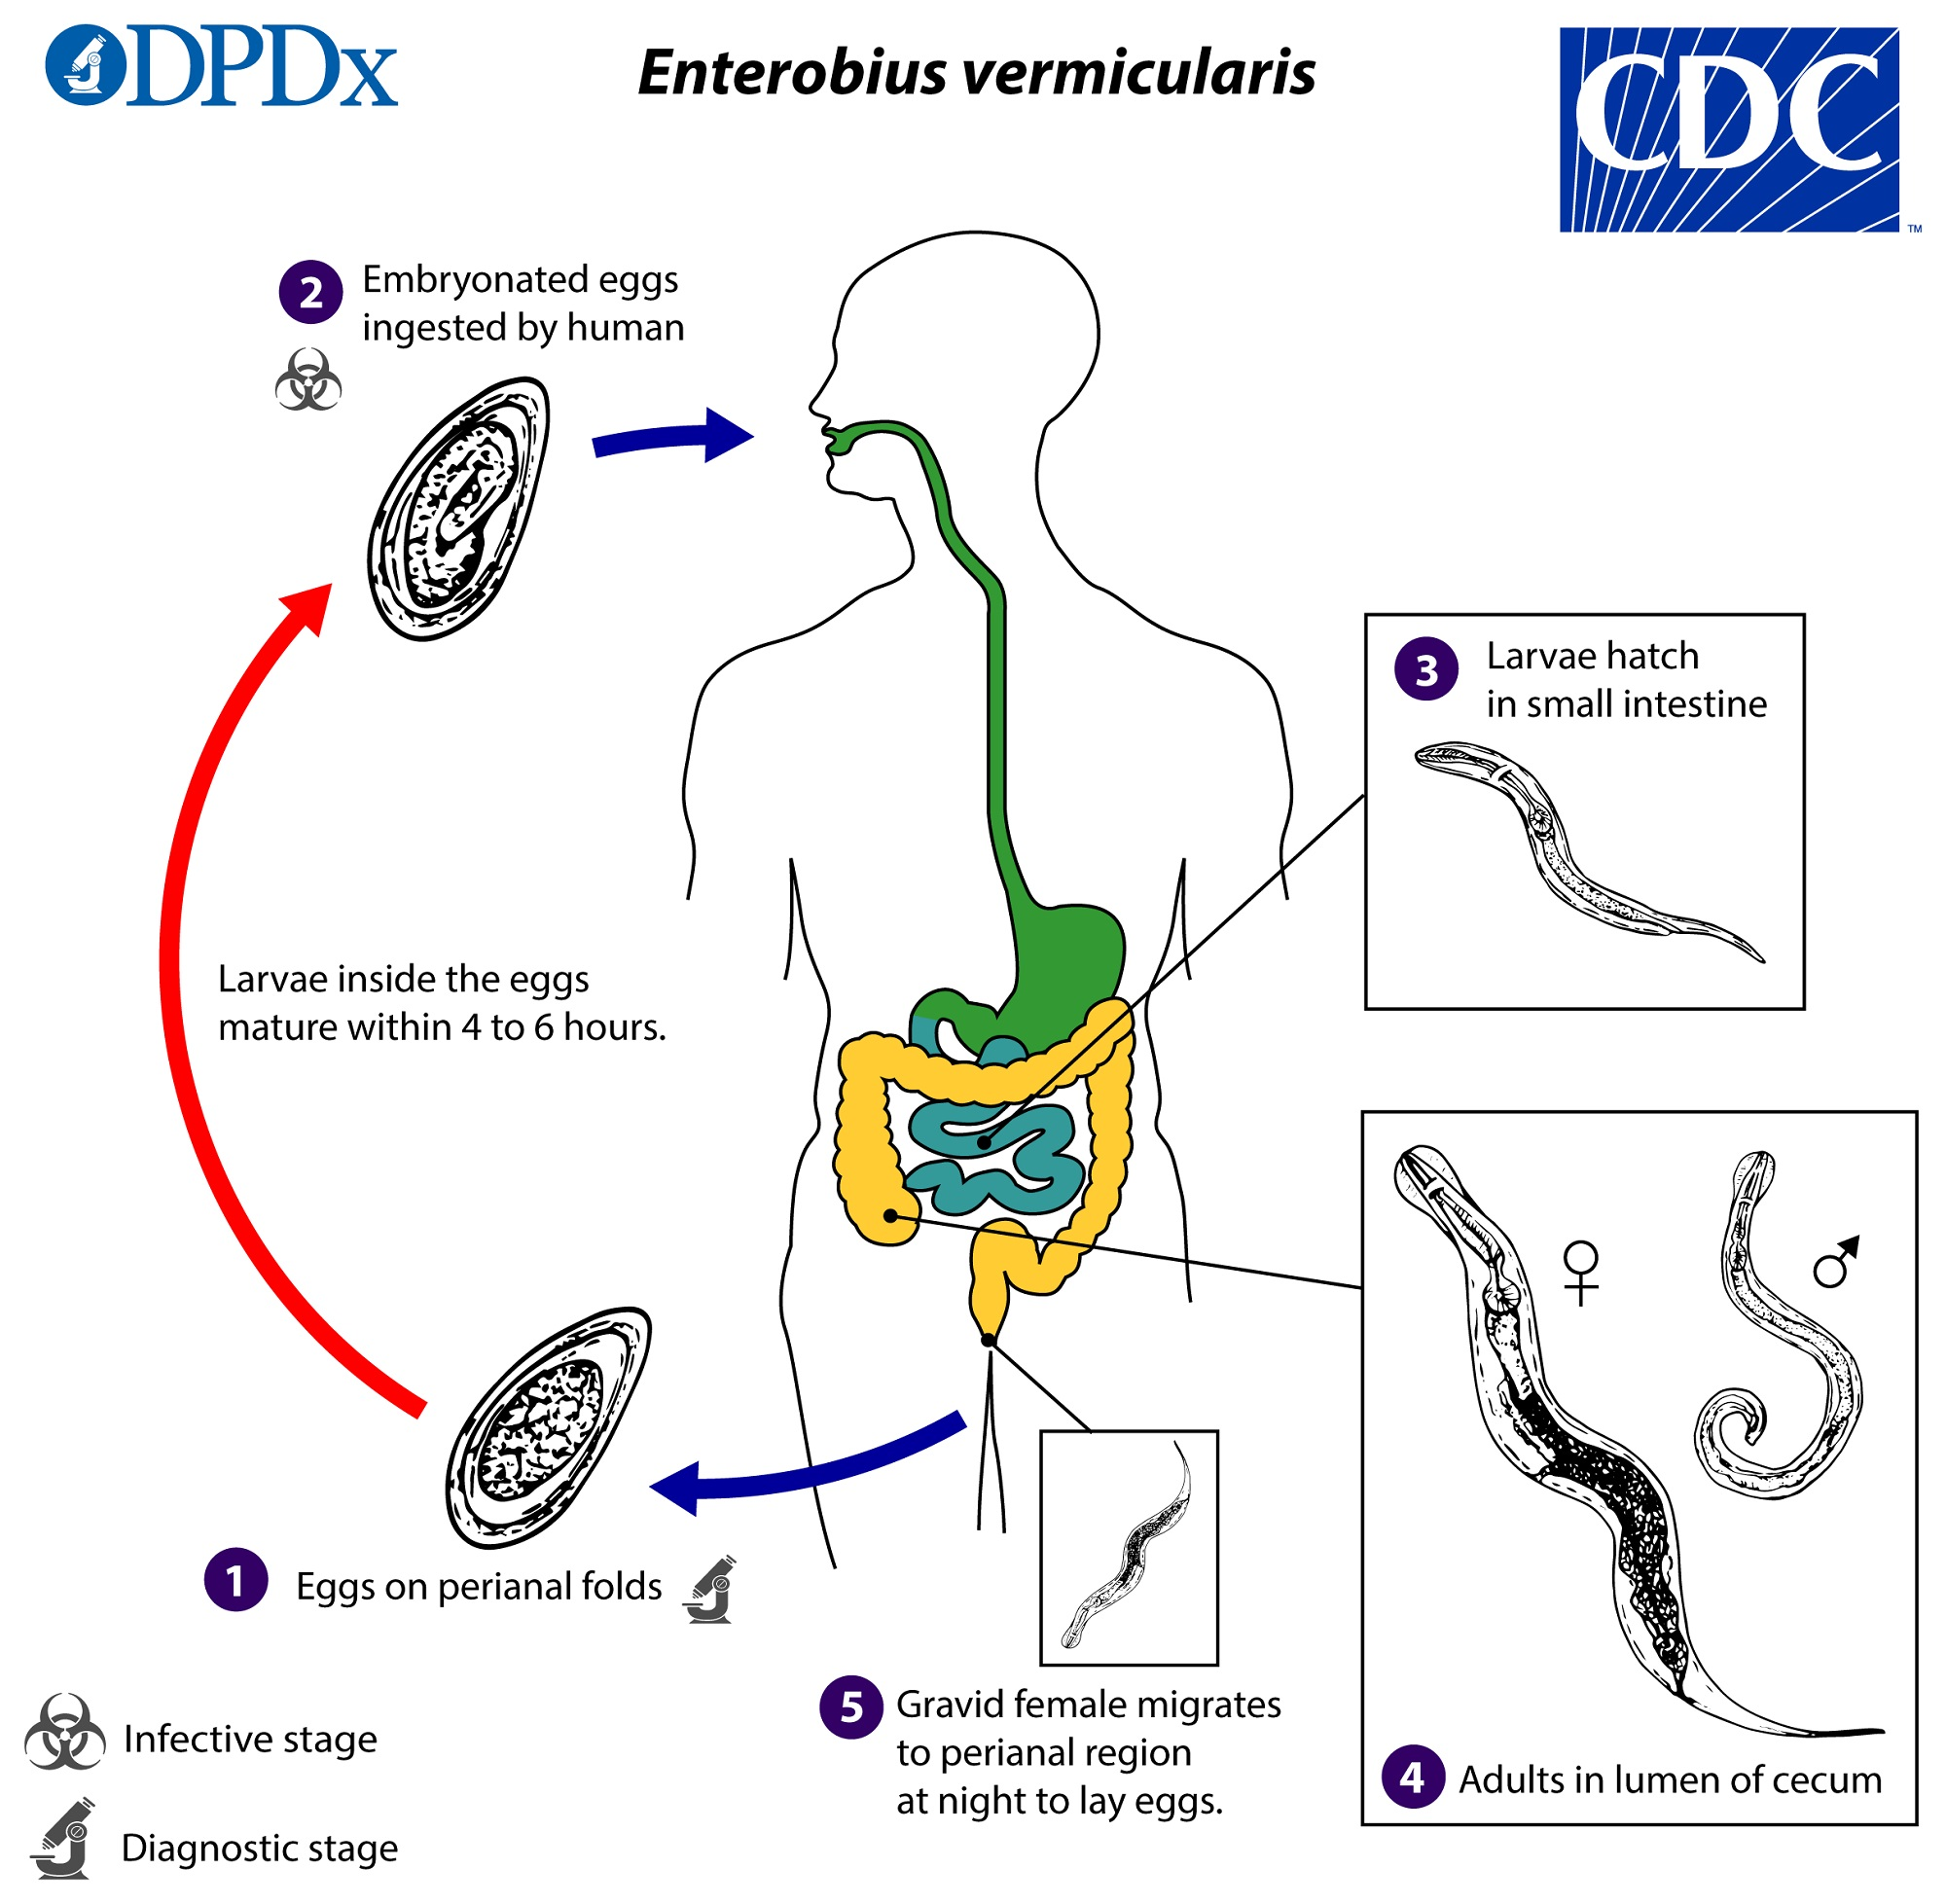 enterobius vermicularis objawy 4. stádiumú petefészekrák tünetei